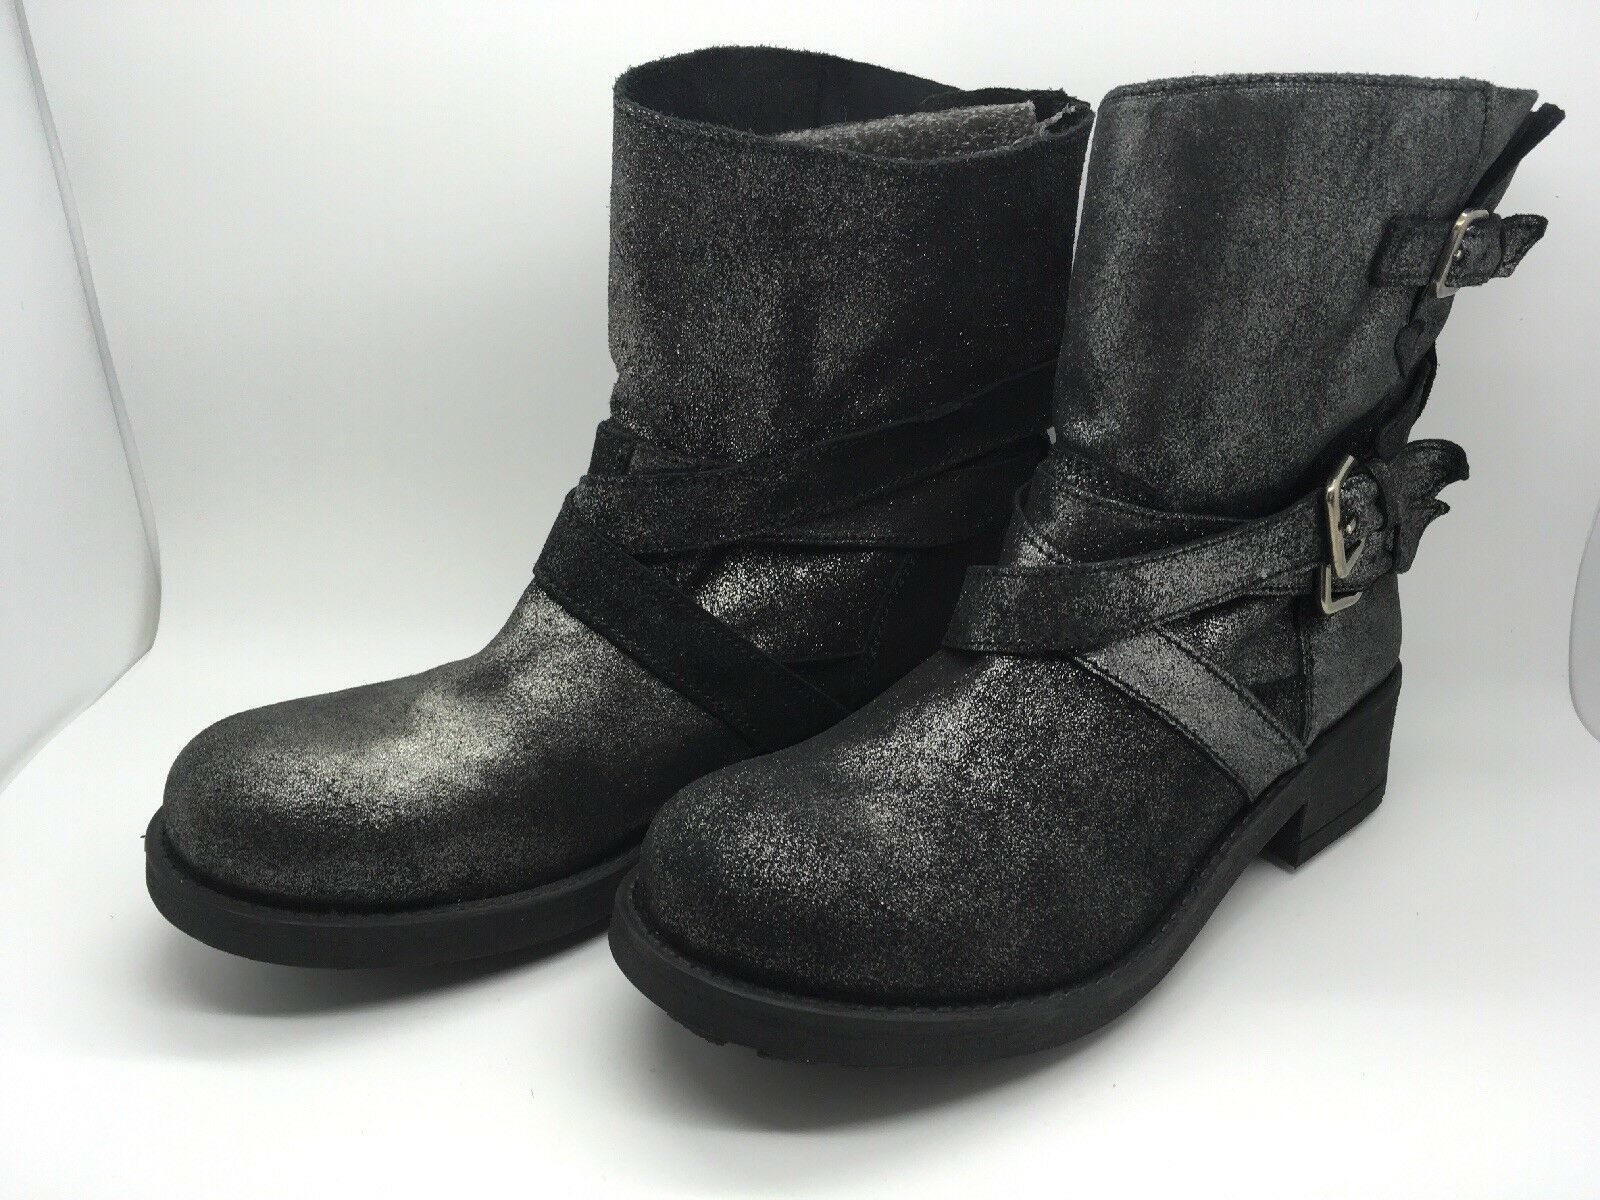 Stiefletten Leder marypaz neu Leder grau glänzend Größe 38 EUR / 6.5 US